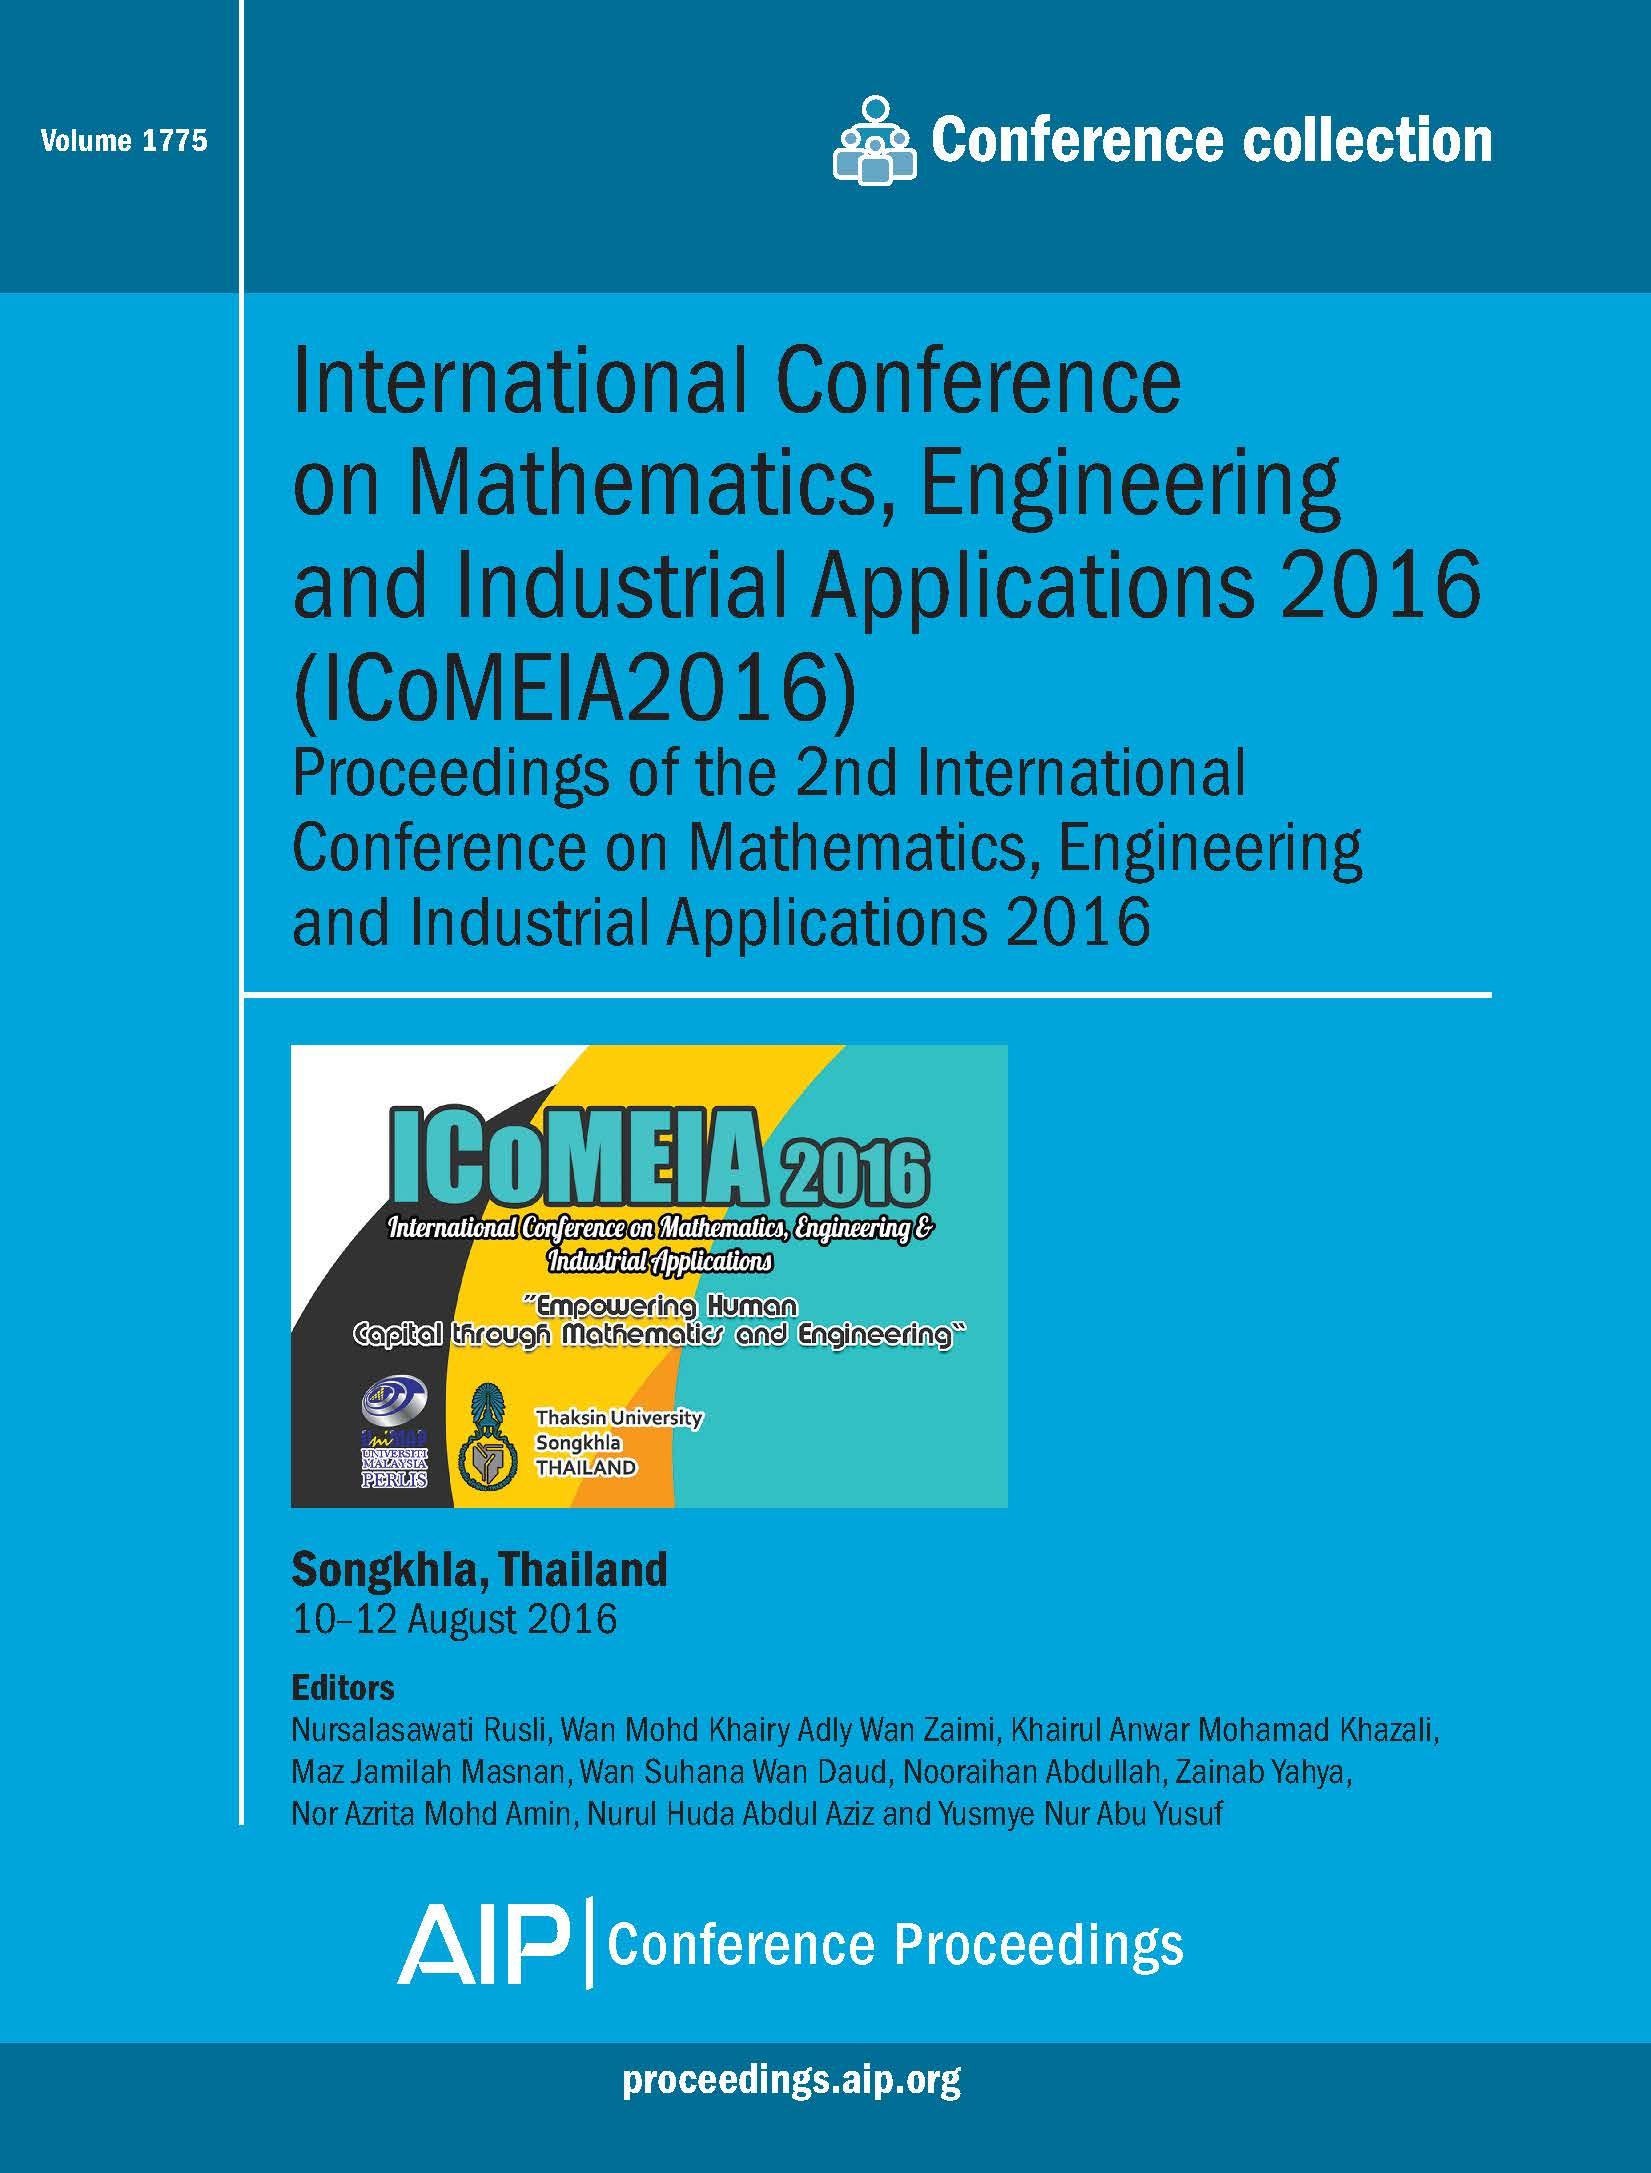 Volume 1775: International Conference on Mathematics, Engineering